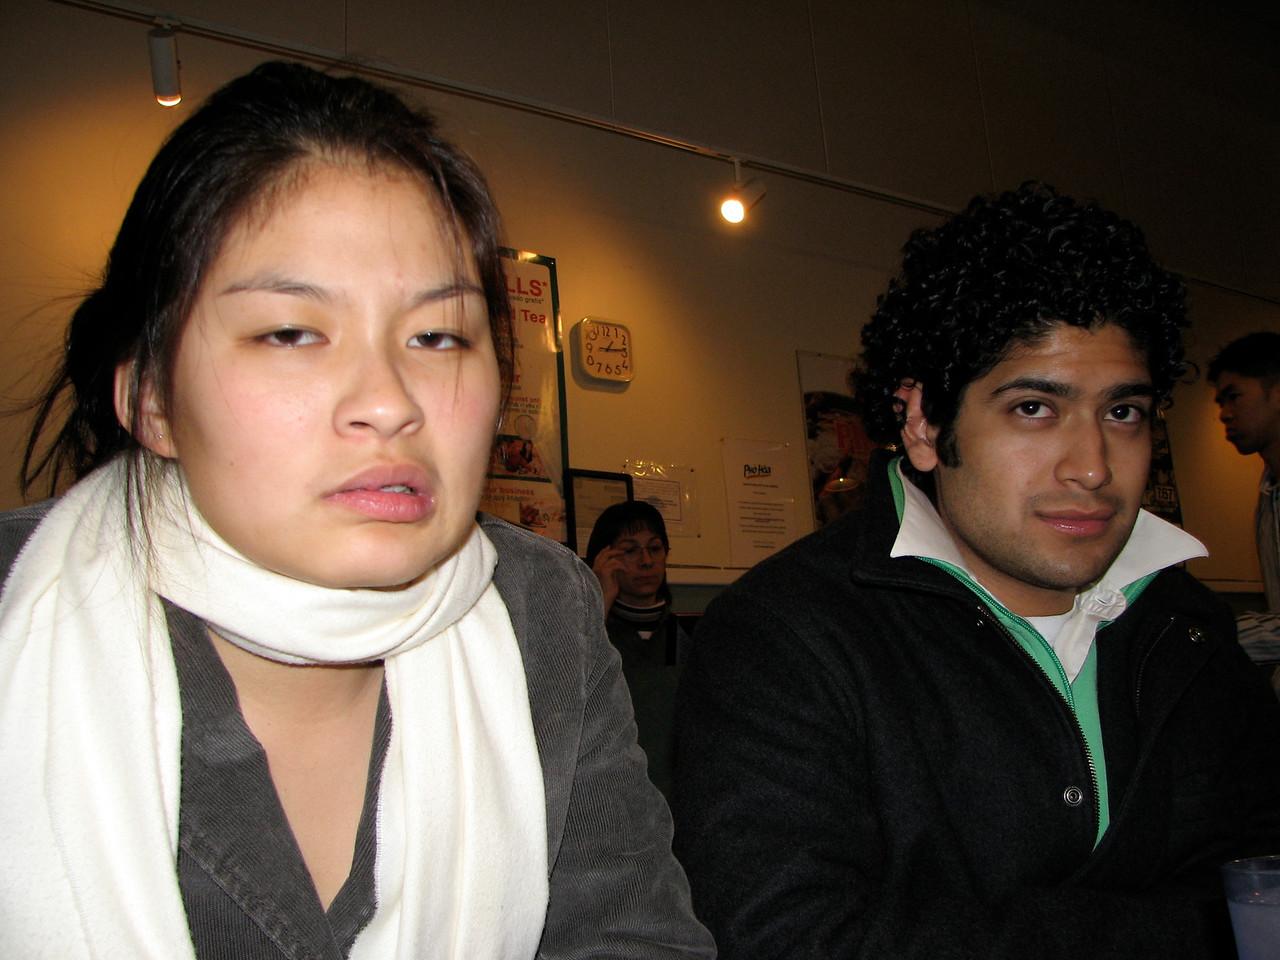 2007 01 28 Sun - Constipated Jenn Kim & relieved Pablo Pozo